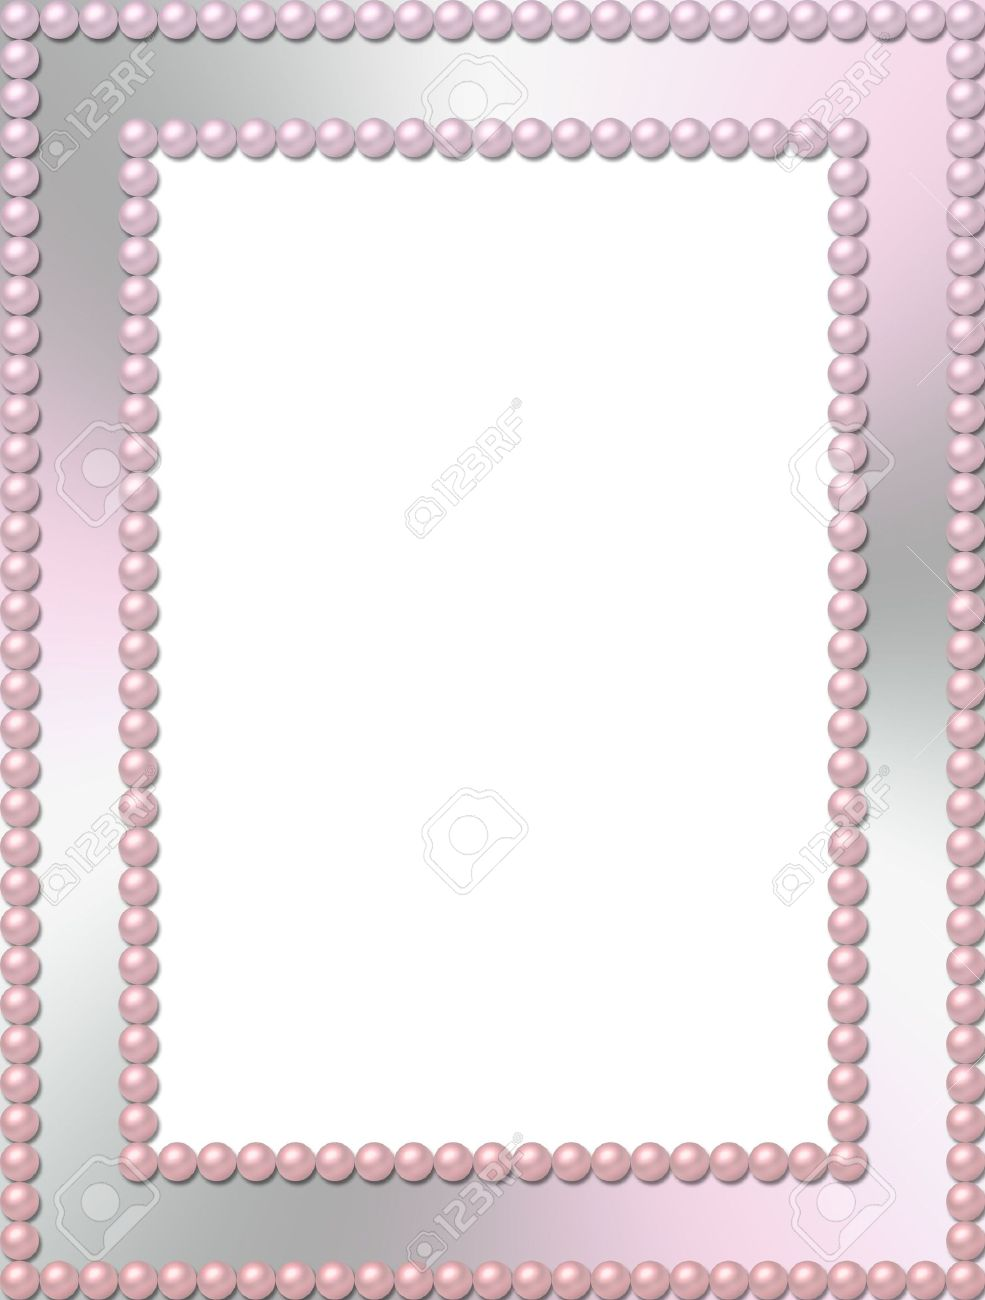 rectangular pearl frame stock photo 4021547